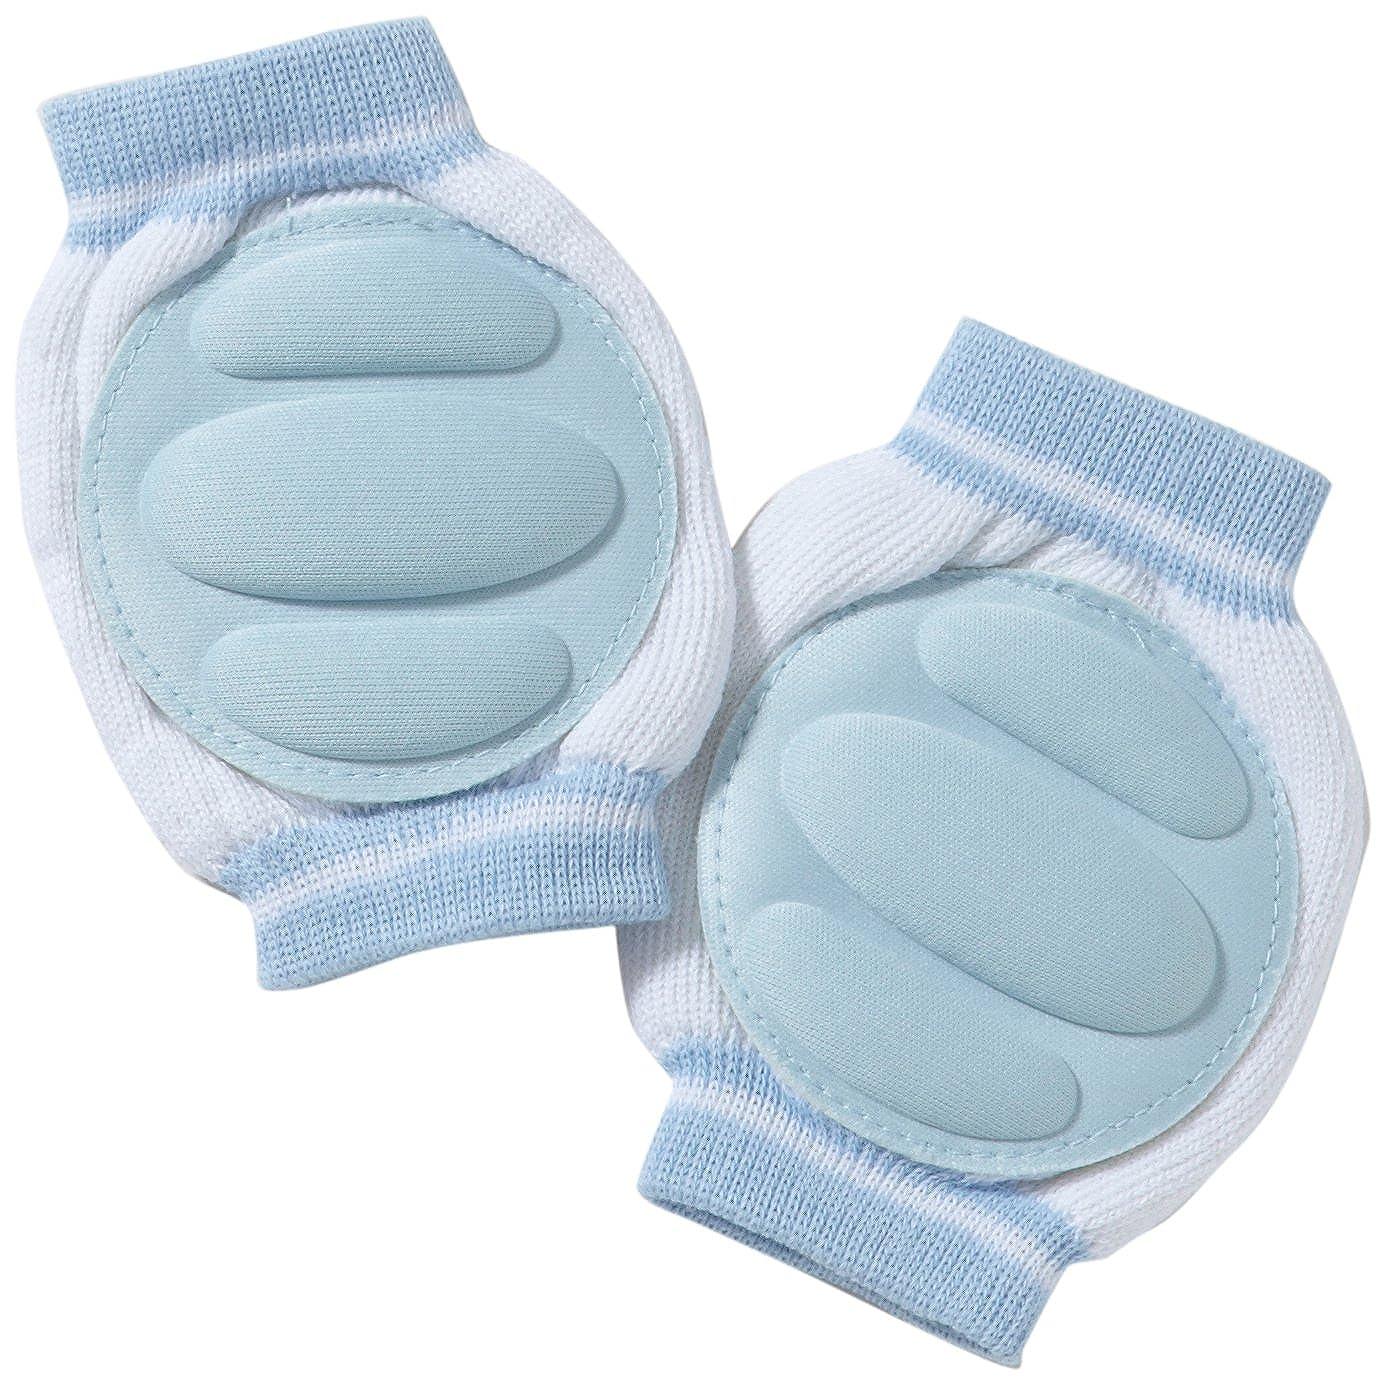 Playshoes - 498801 Von, Ginocchiera per gattonare per bimbi Playshoes 498801 von Blu(Blau (Hellblau) Taglia Produttore: One Size Playshoes GmbH